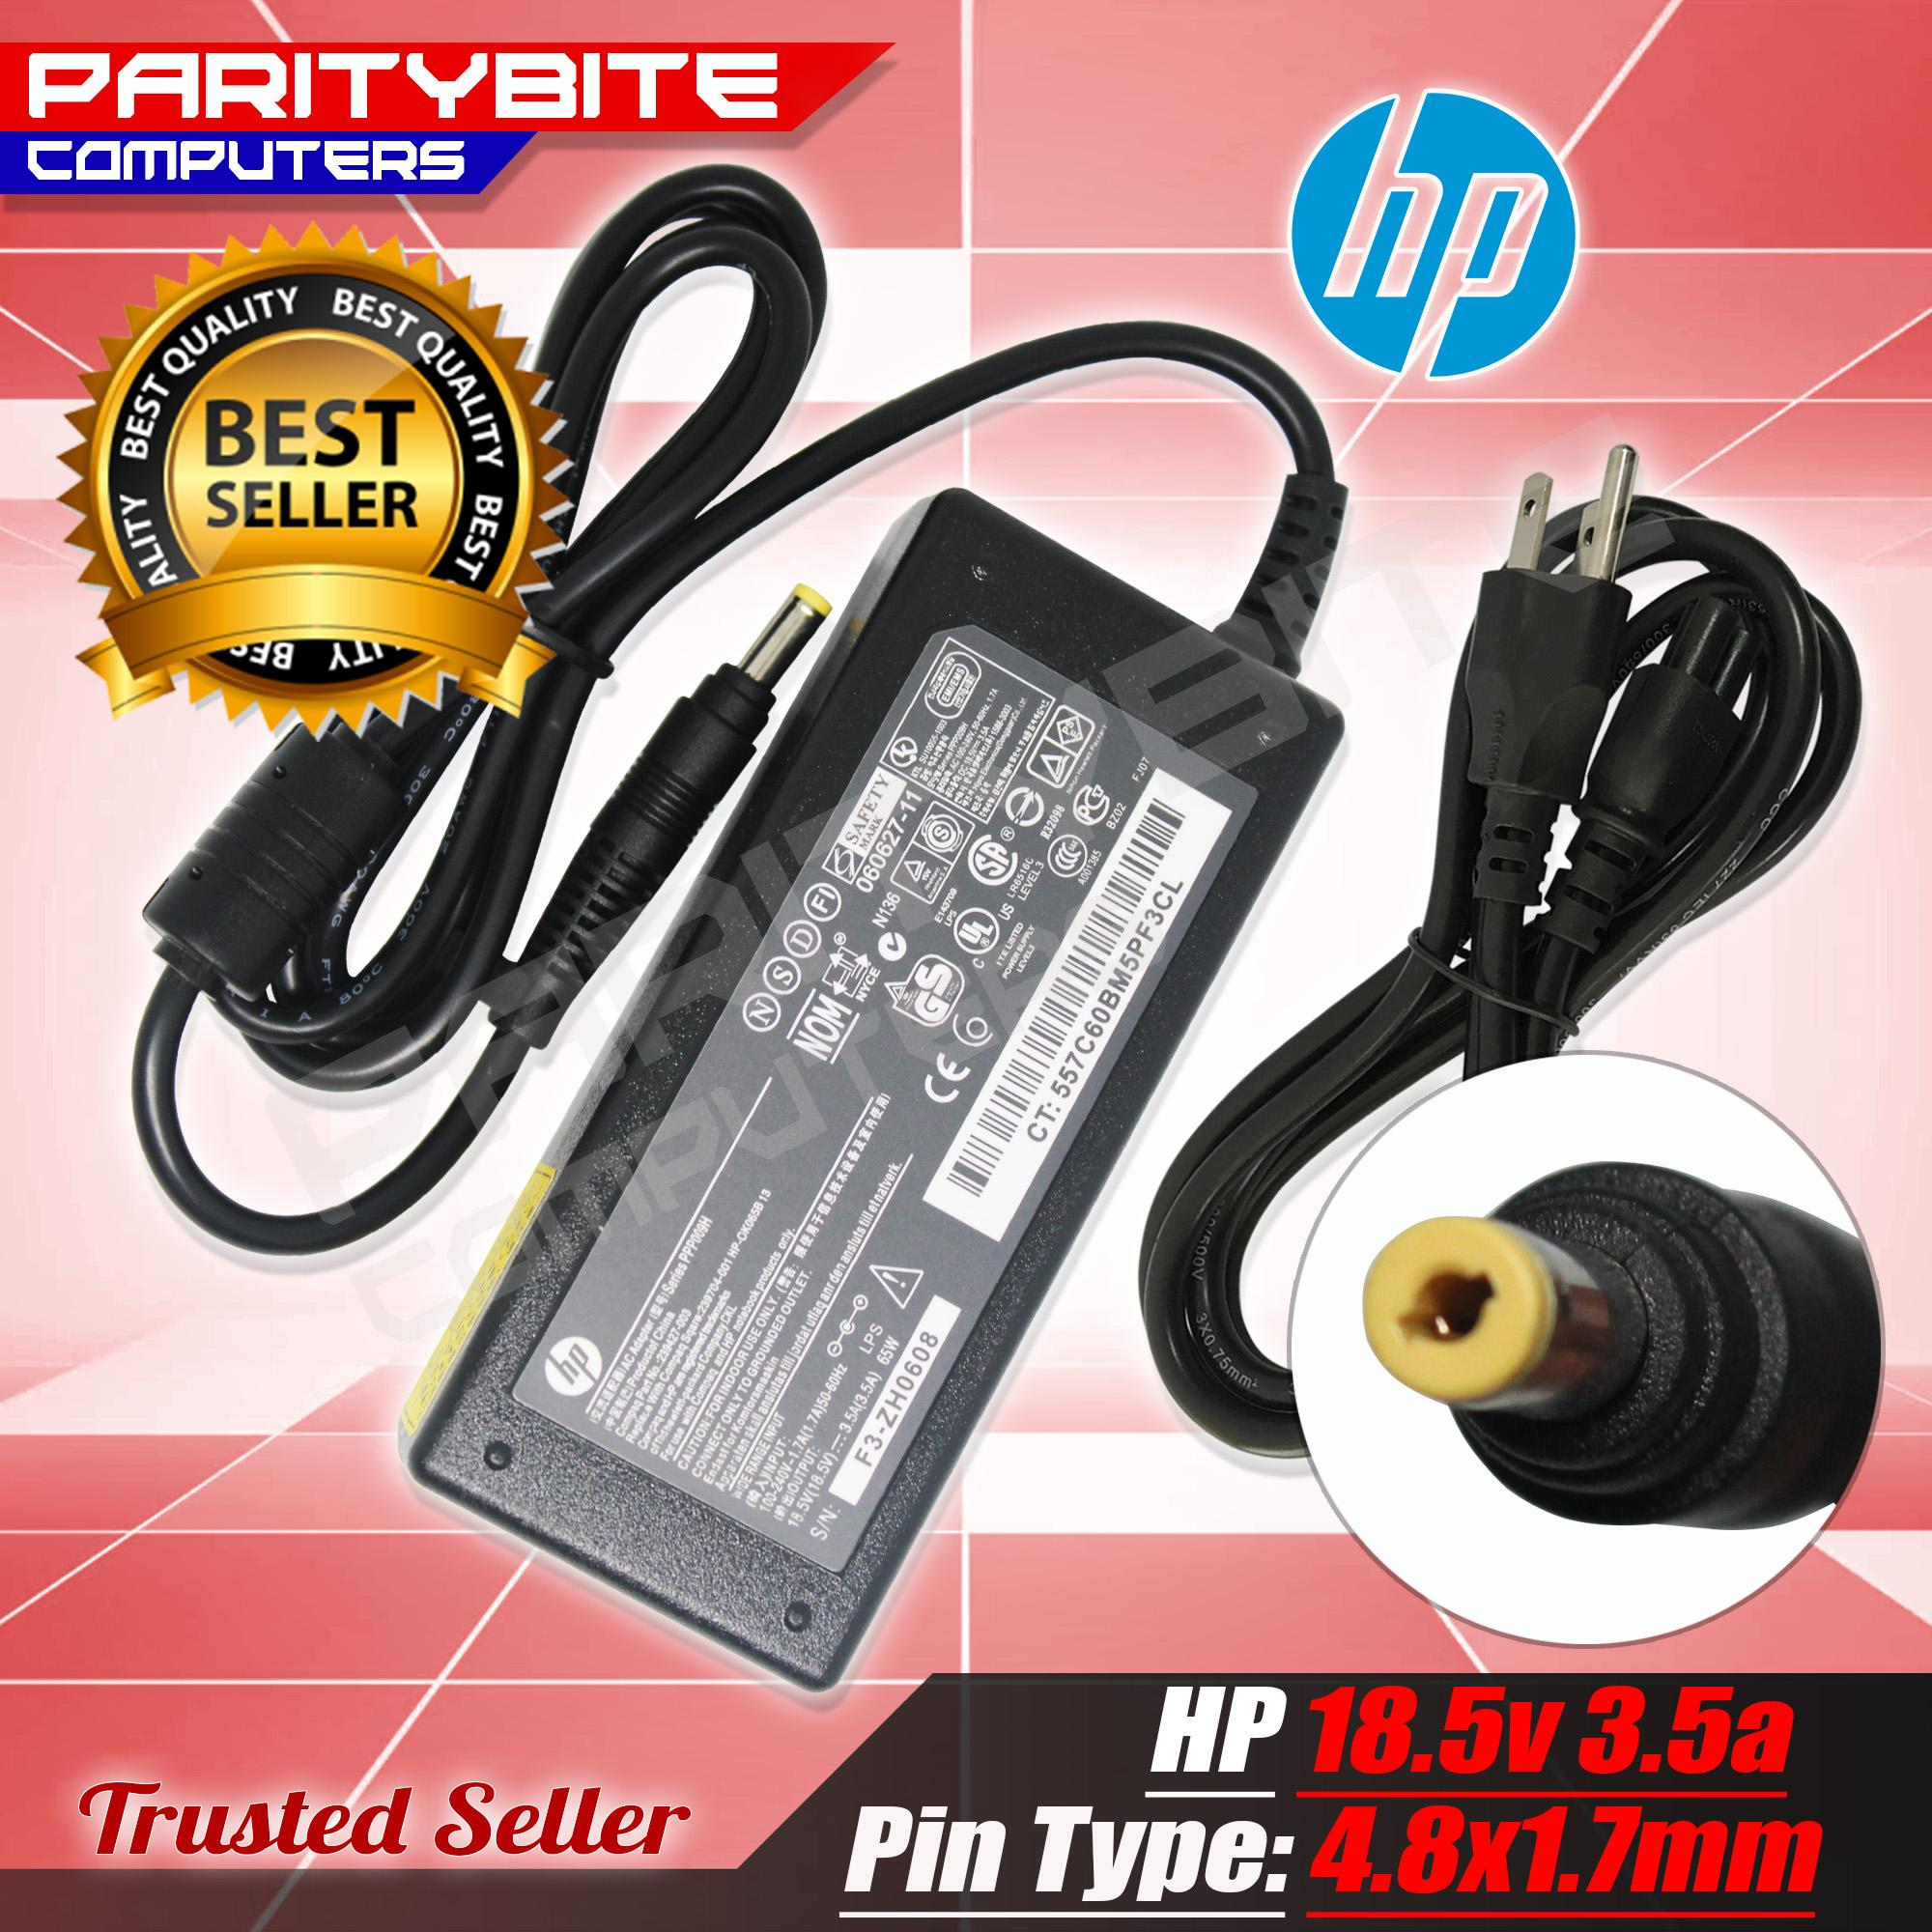 HP MINI 110-3003XX NOTEBOOK MOTOROLA BLUETOOTH DRIVERS FOR WINDOWS